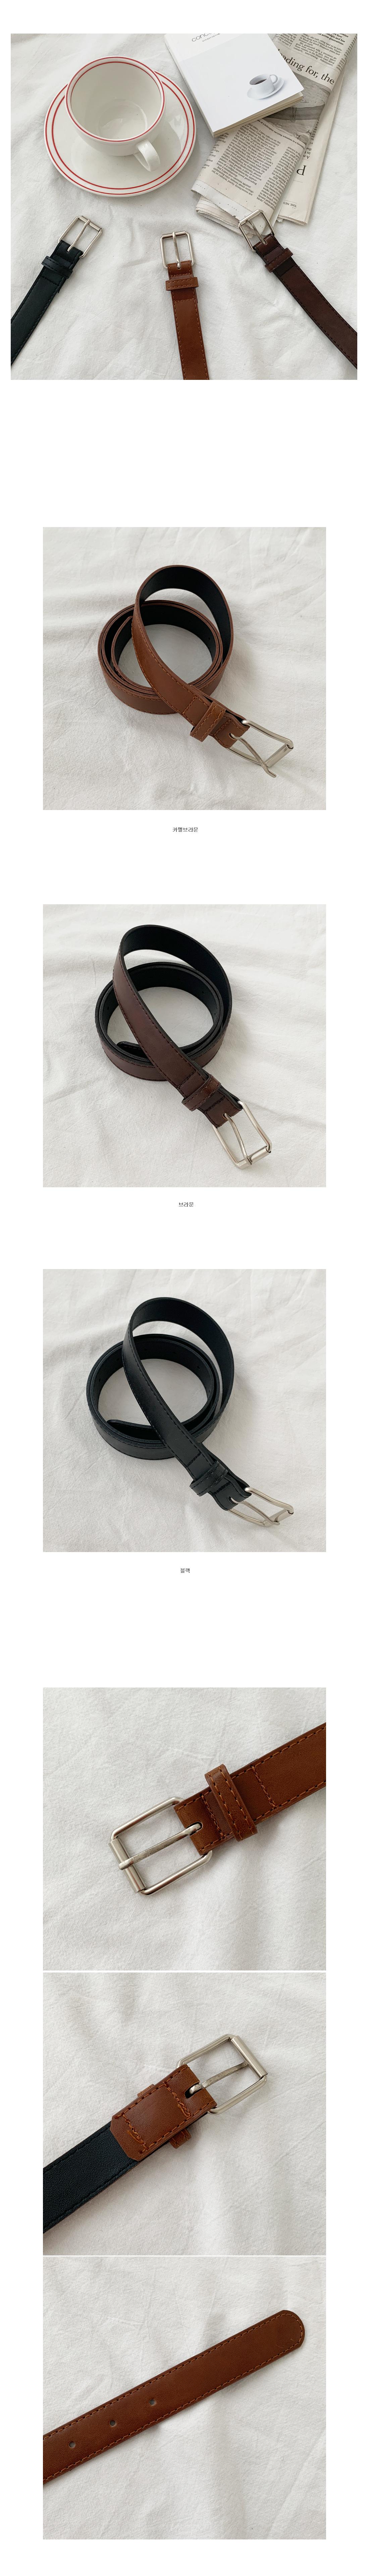 Pipe belt *